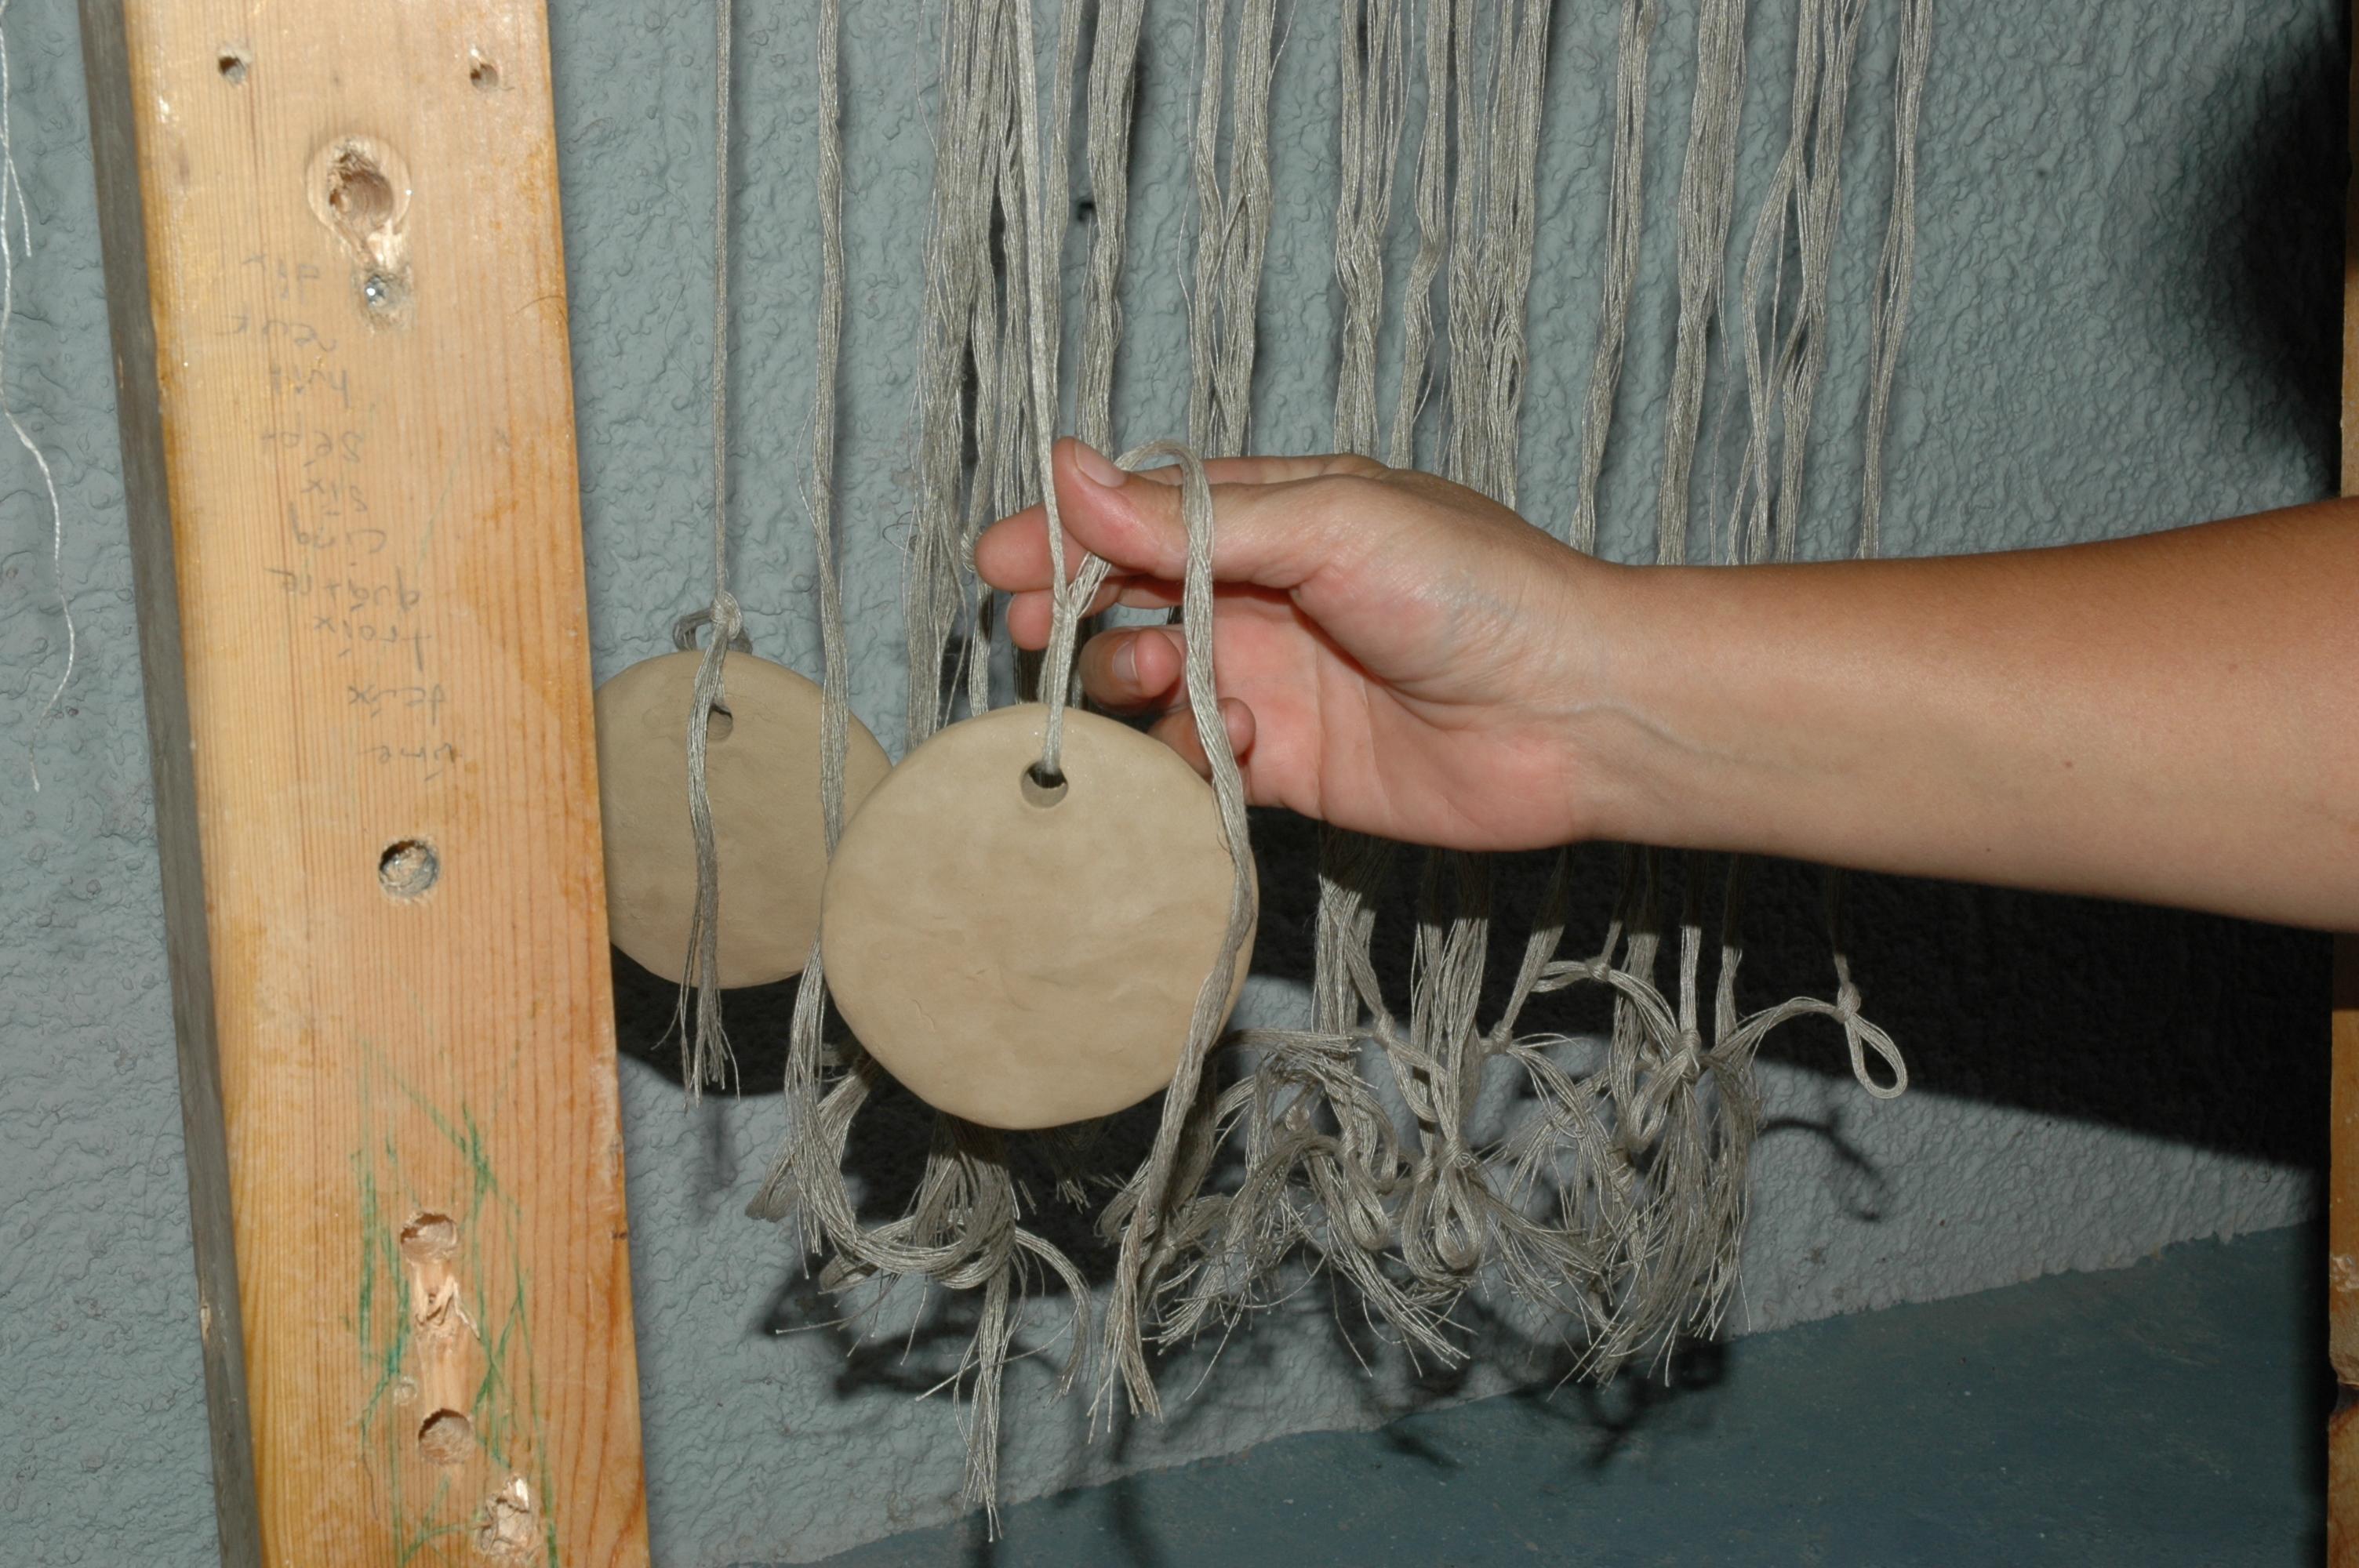 Attaching the warp threads to the loom-weights. Photo S. Spantidaki.